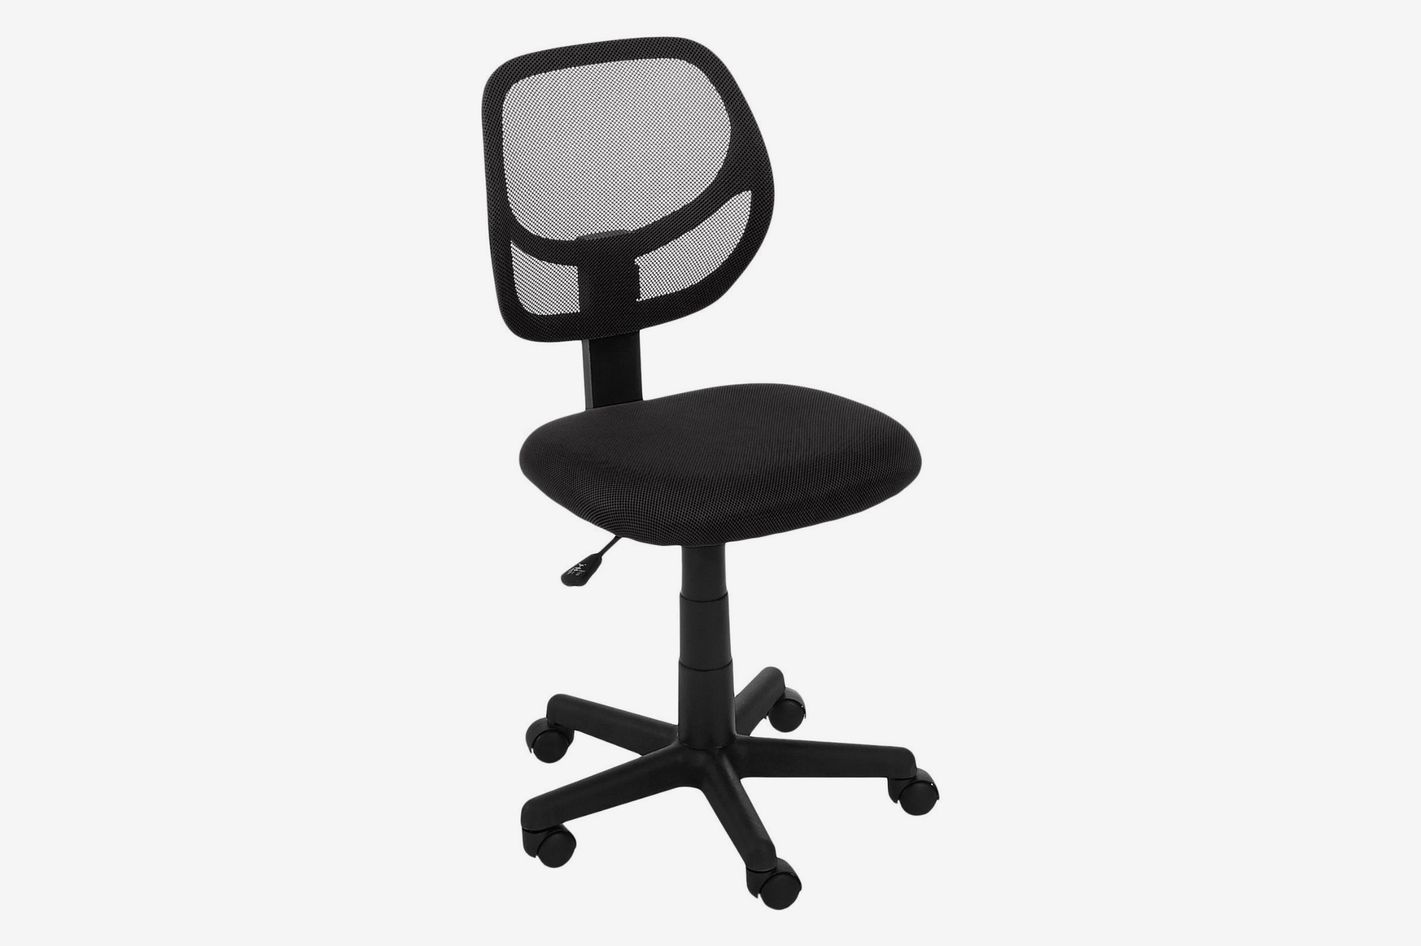 Amazonbasics Black Mesh Armless Office Chair